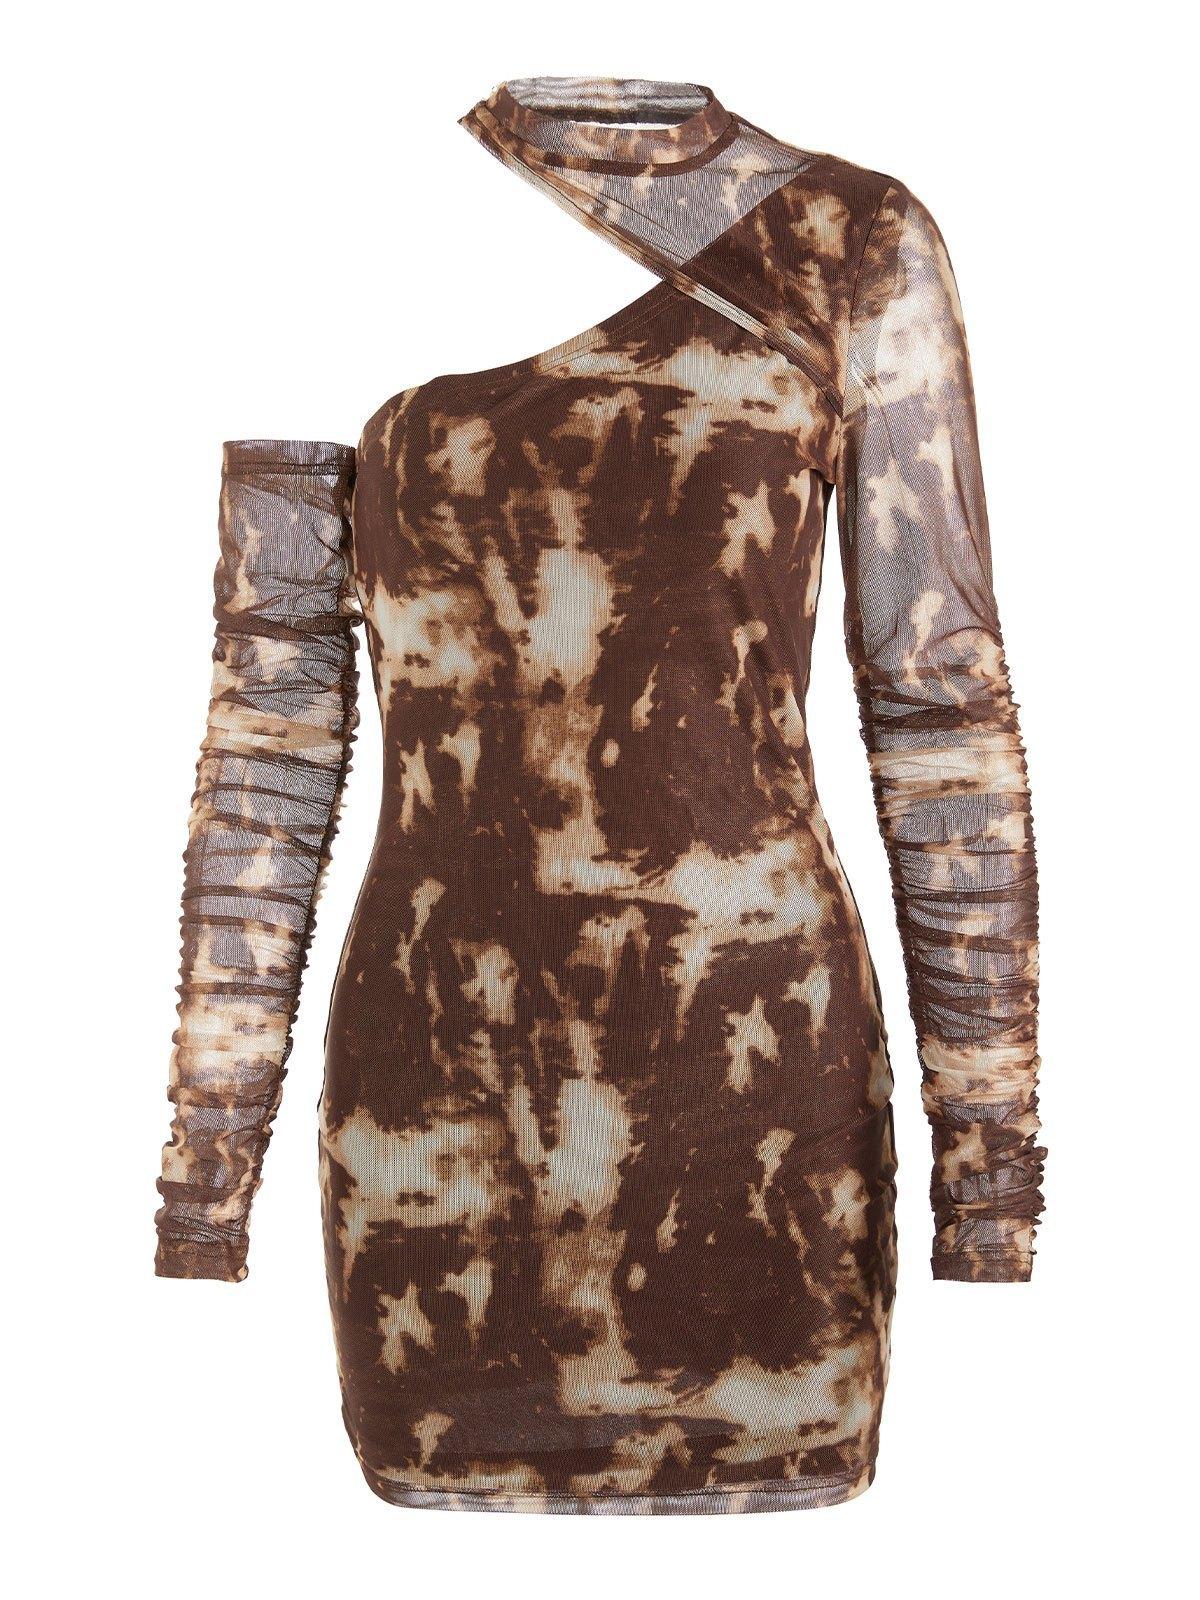 EMMIOL Cutout Tie Dye Long Sleeve Midi Dress - Brown S